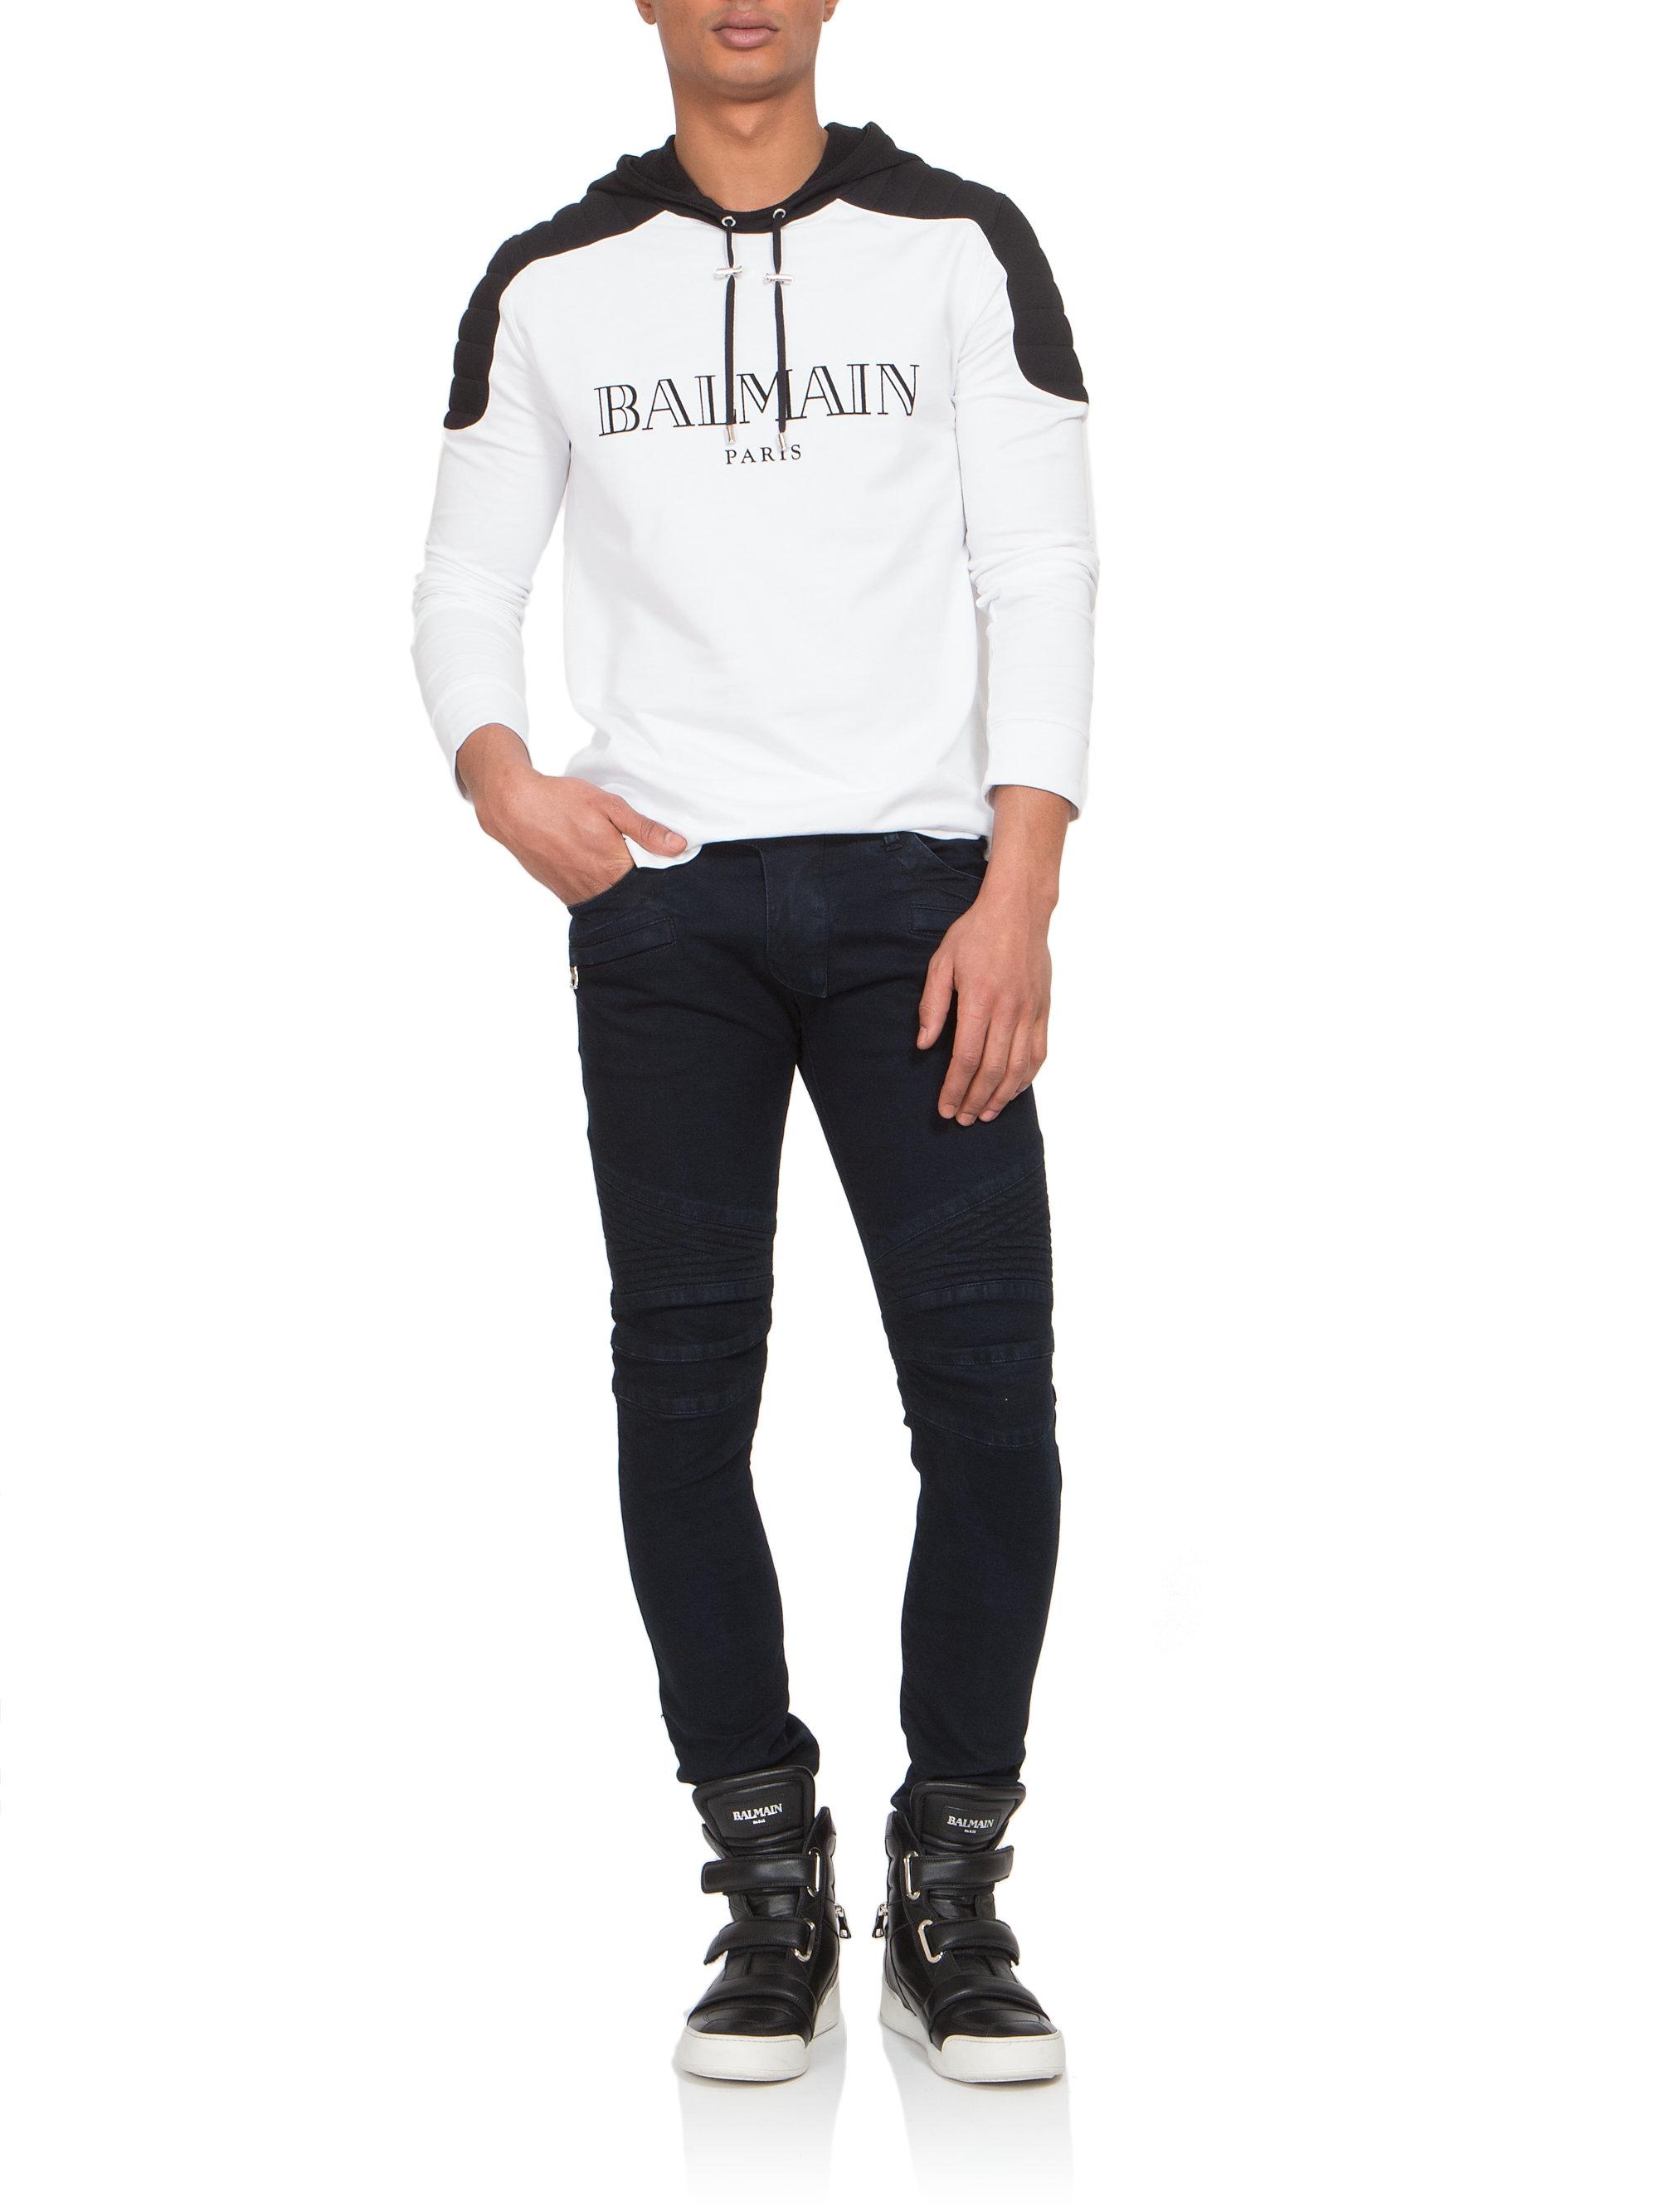 Balmain hoodie